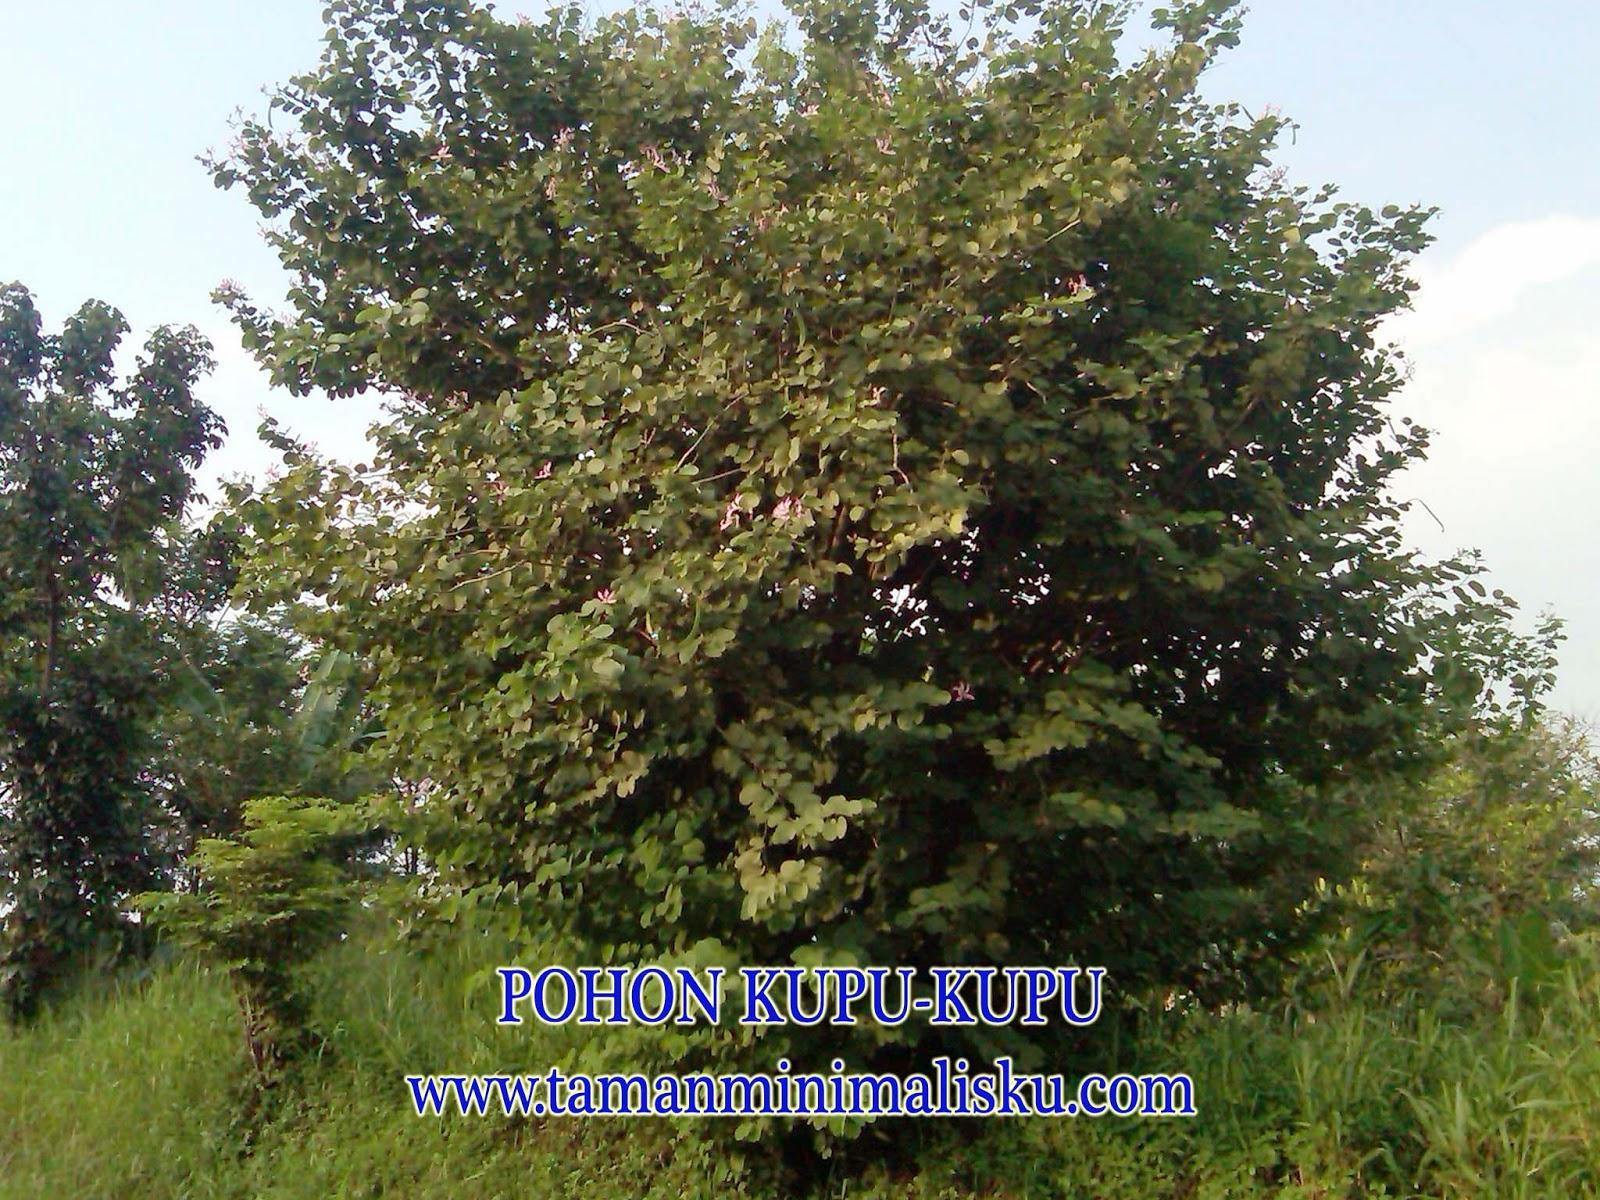 Jual pohon kupu kupu | pohon pelindung